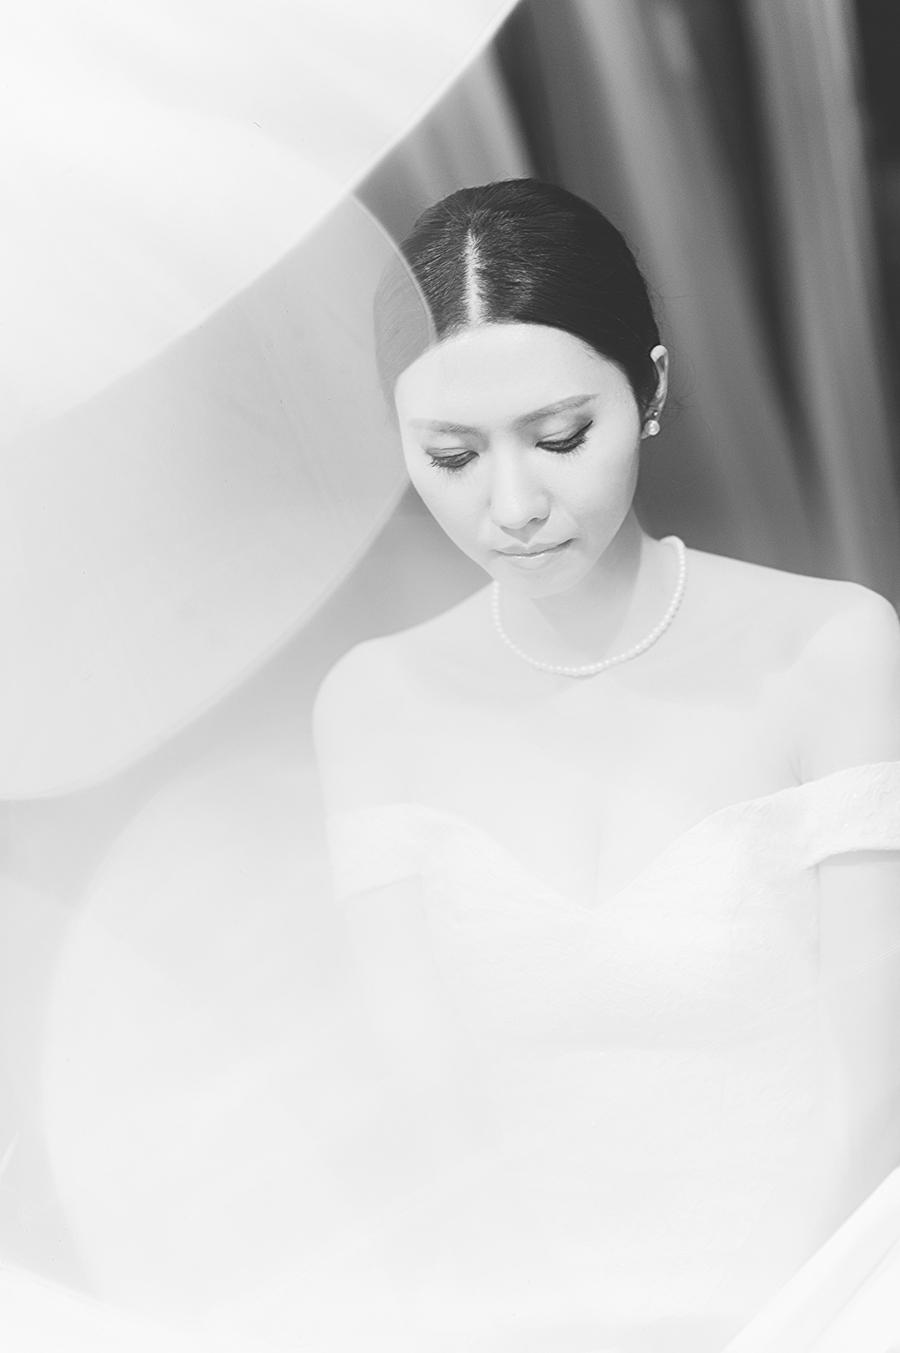 Nickchang-fineart-wedding-18